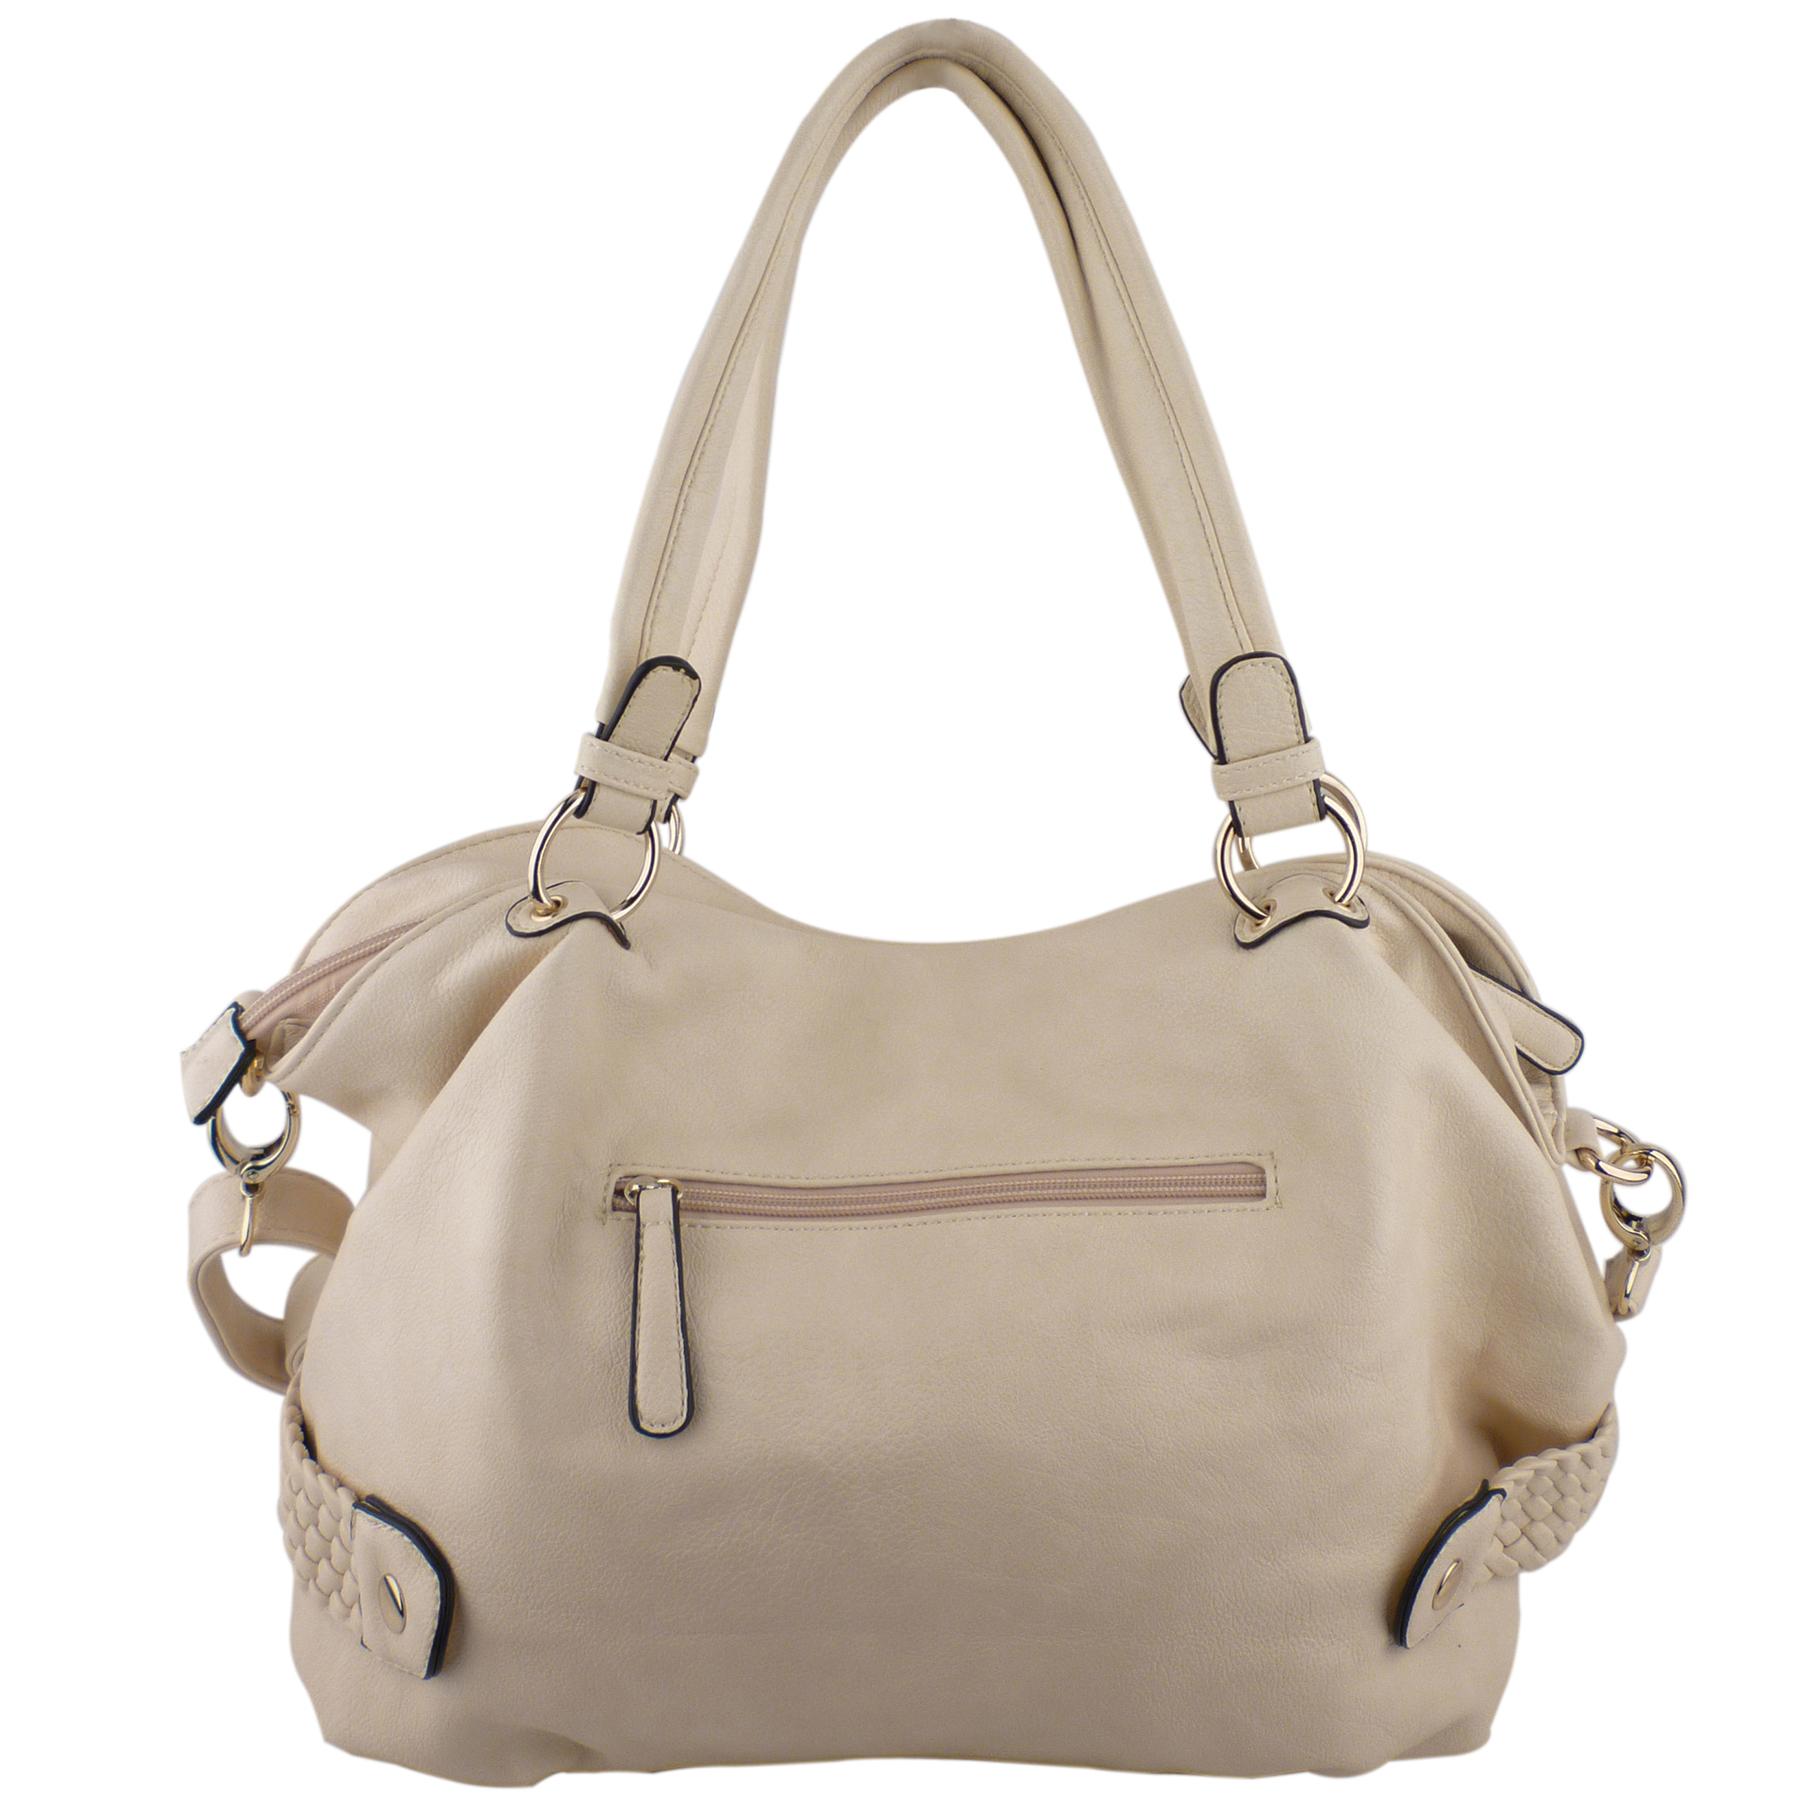 SAMANTHA Cream Weave Pattern Soft Hobo Handbag Back